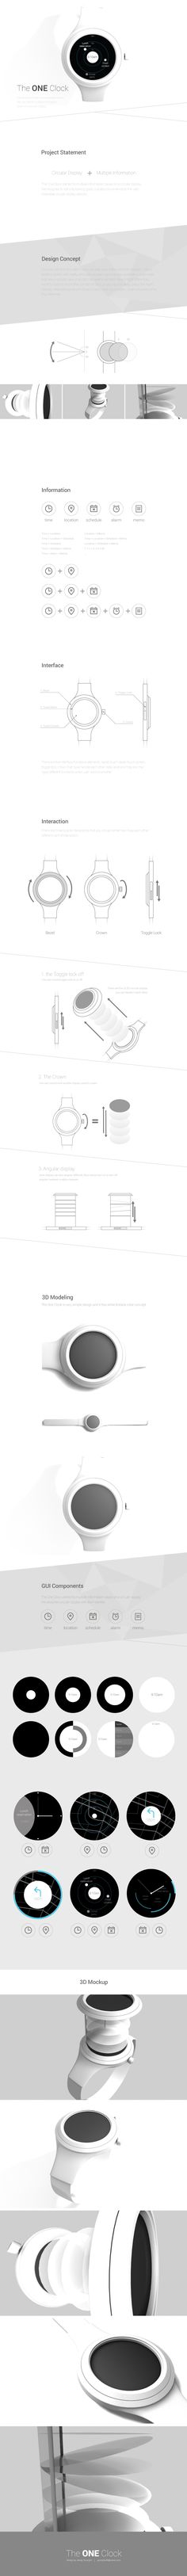 JeongYoungho | The ONE Clock | Visual Interface Design(2) 2016 | Major in Digital Media Design │#hicoda │hicoda.hongik.ac.kr